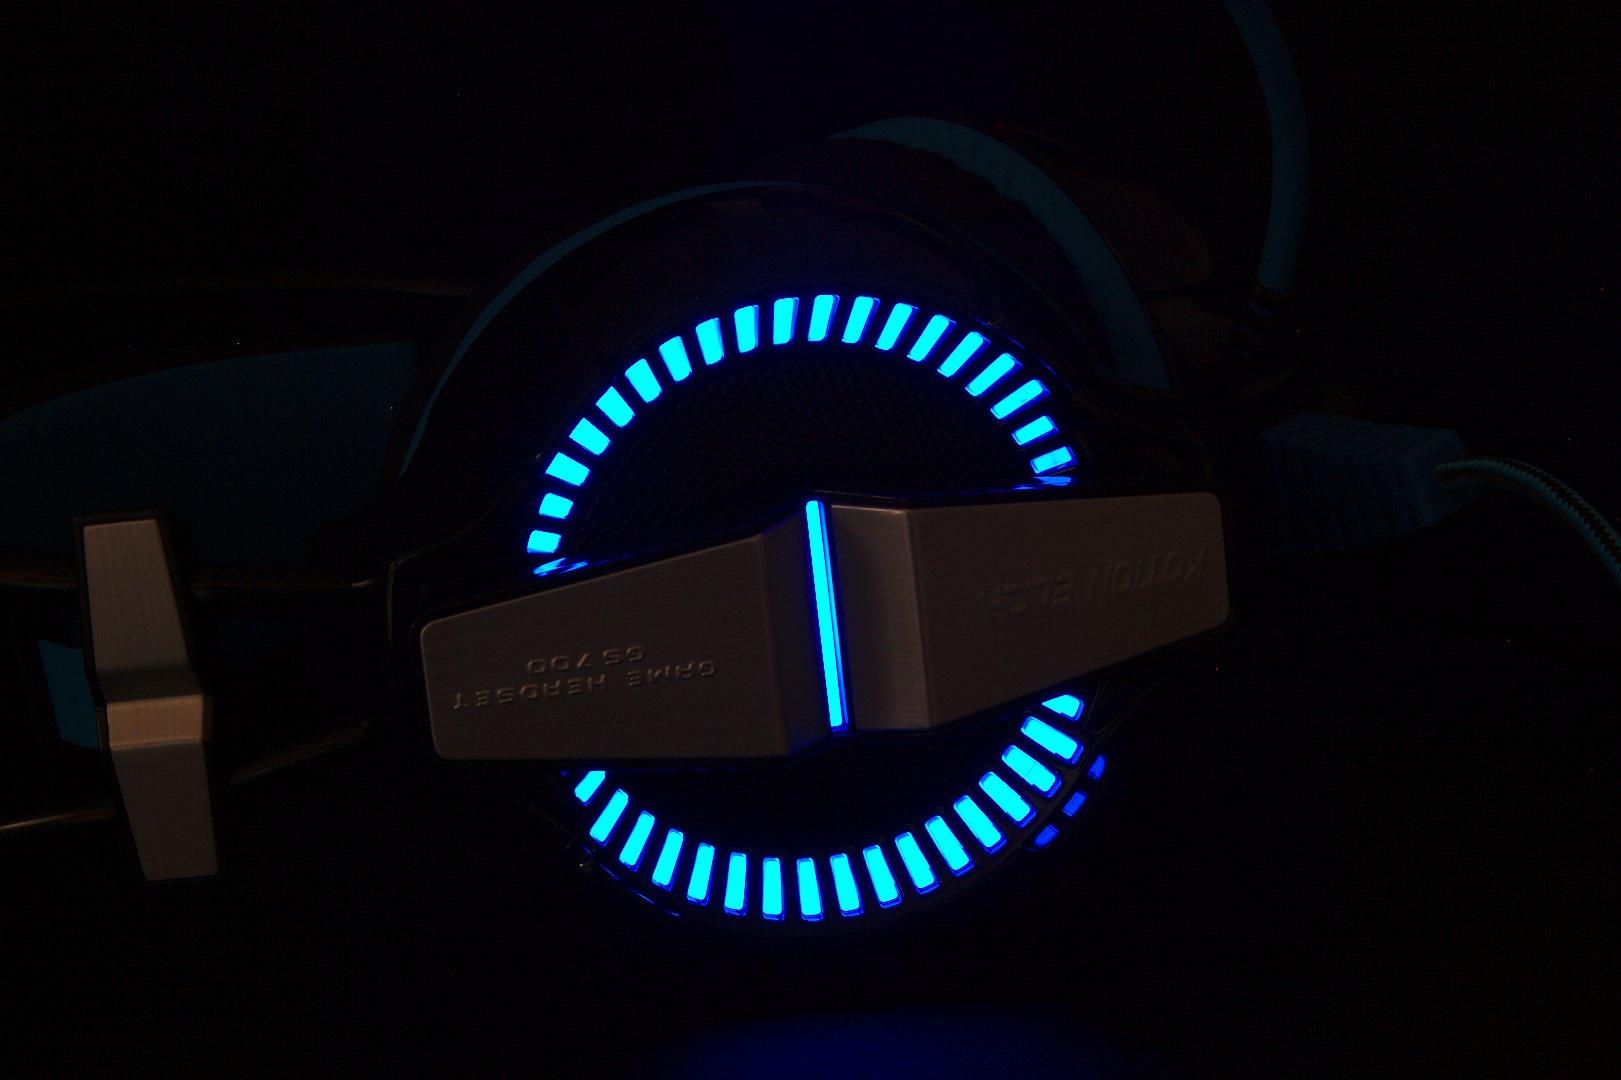 aoso gs700 mit led beleuchtung im test gamer headset. Black Bedroom Furniture Sets. Home Design Ideas